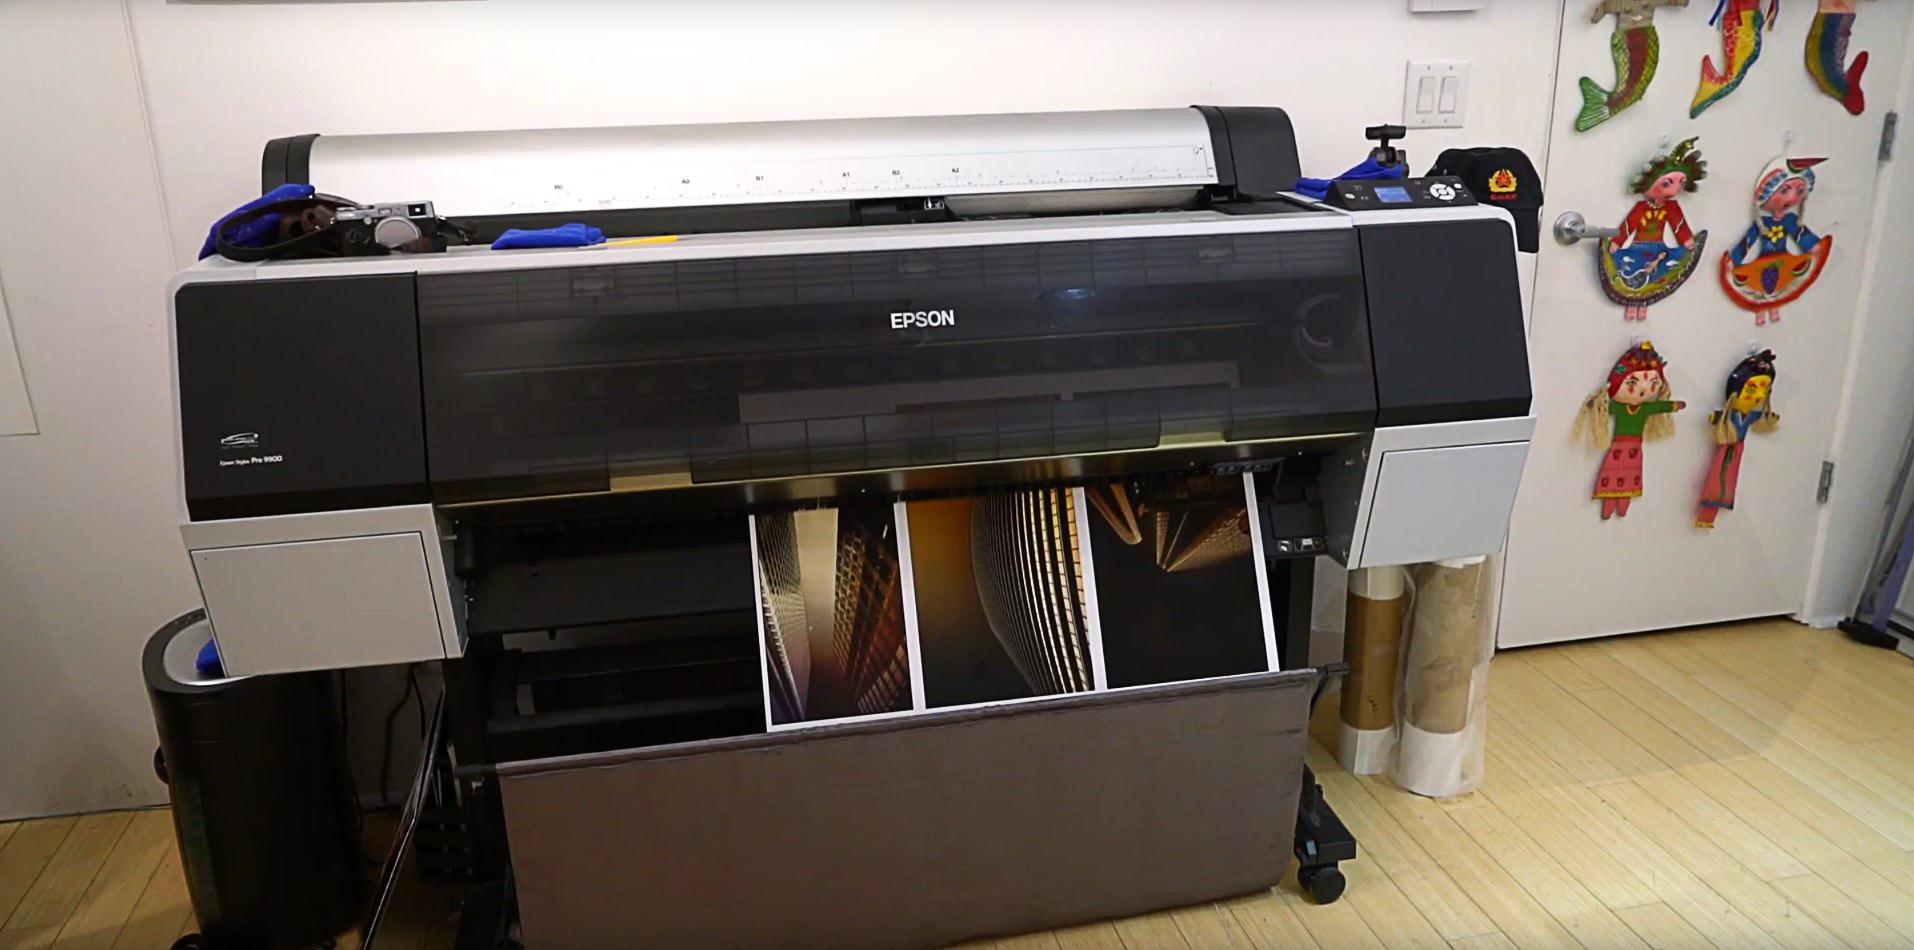 print on metal epson printer